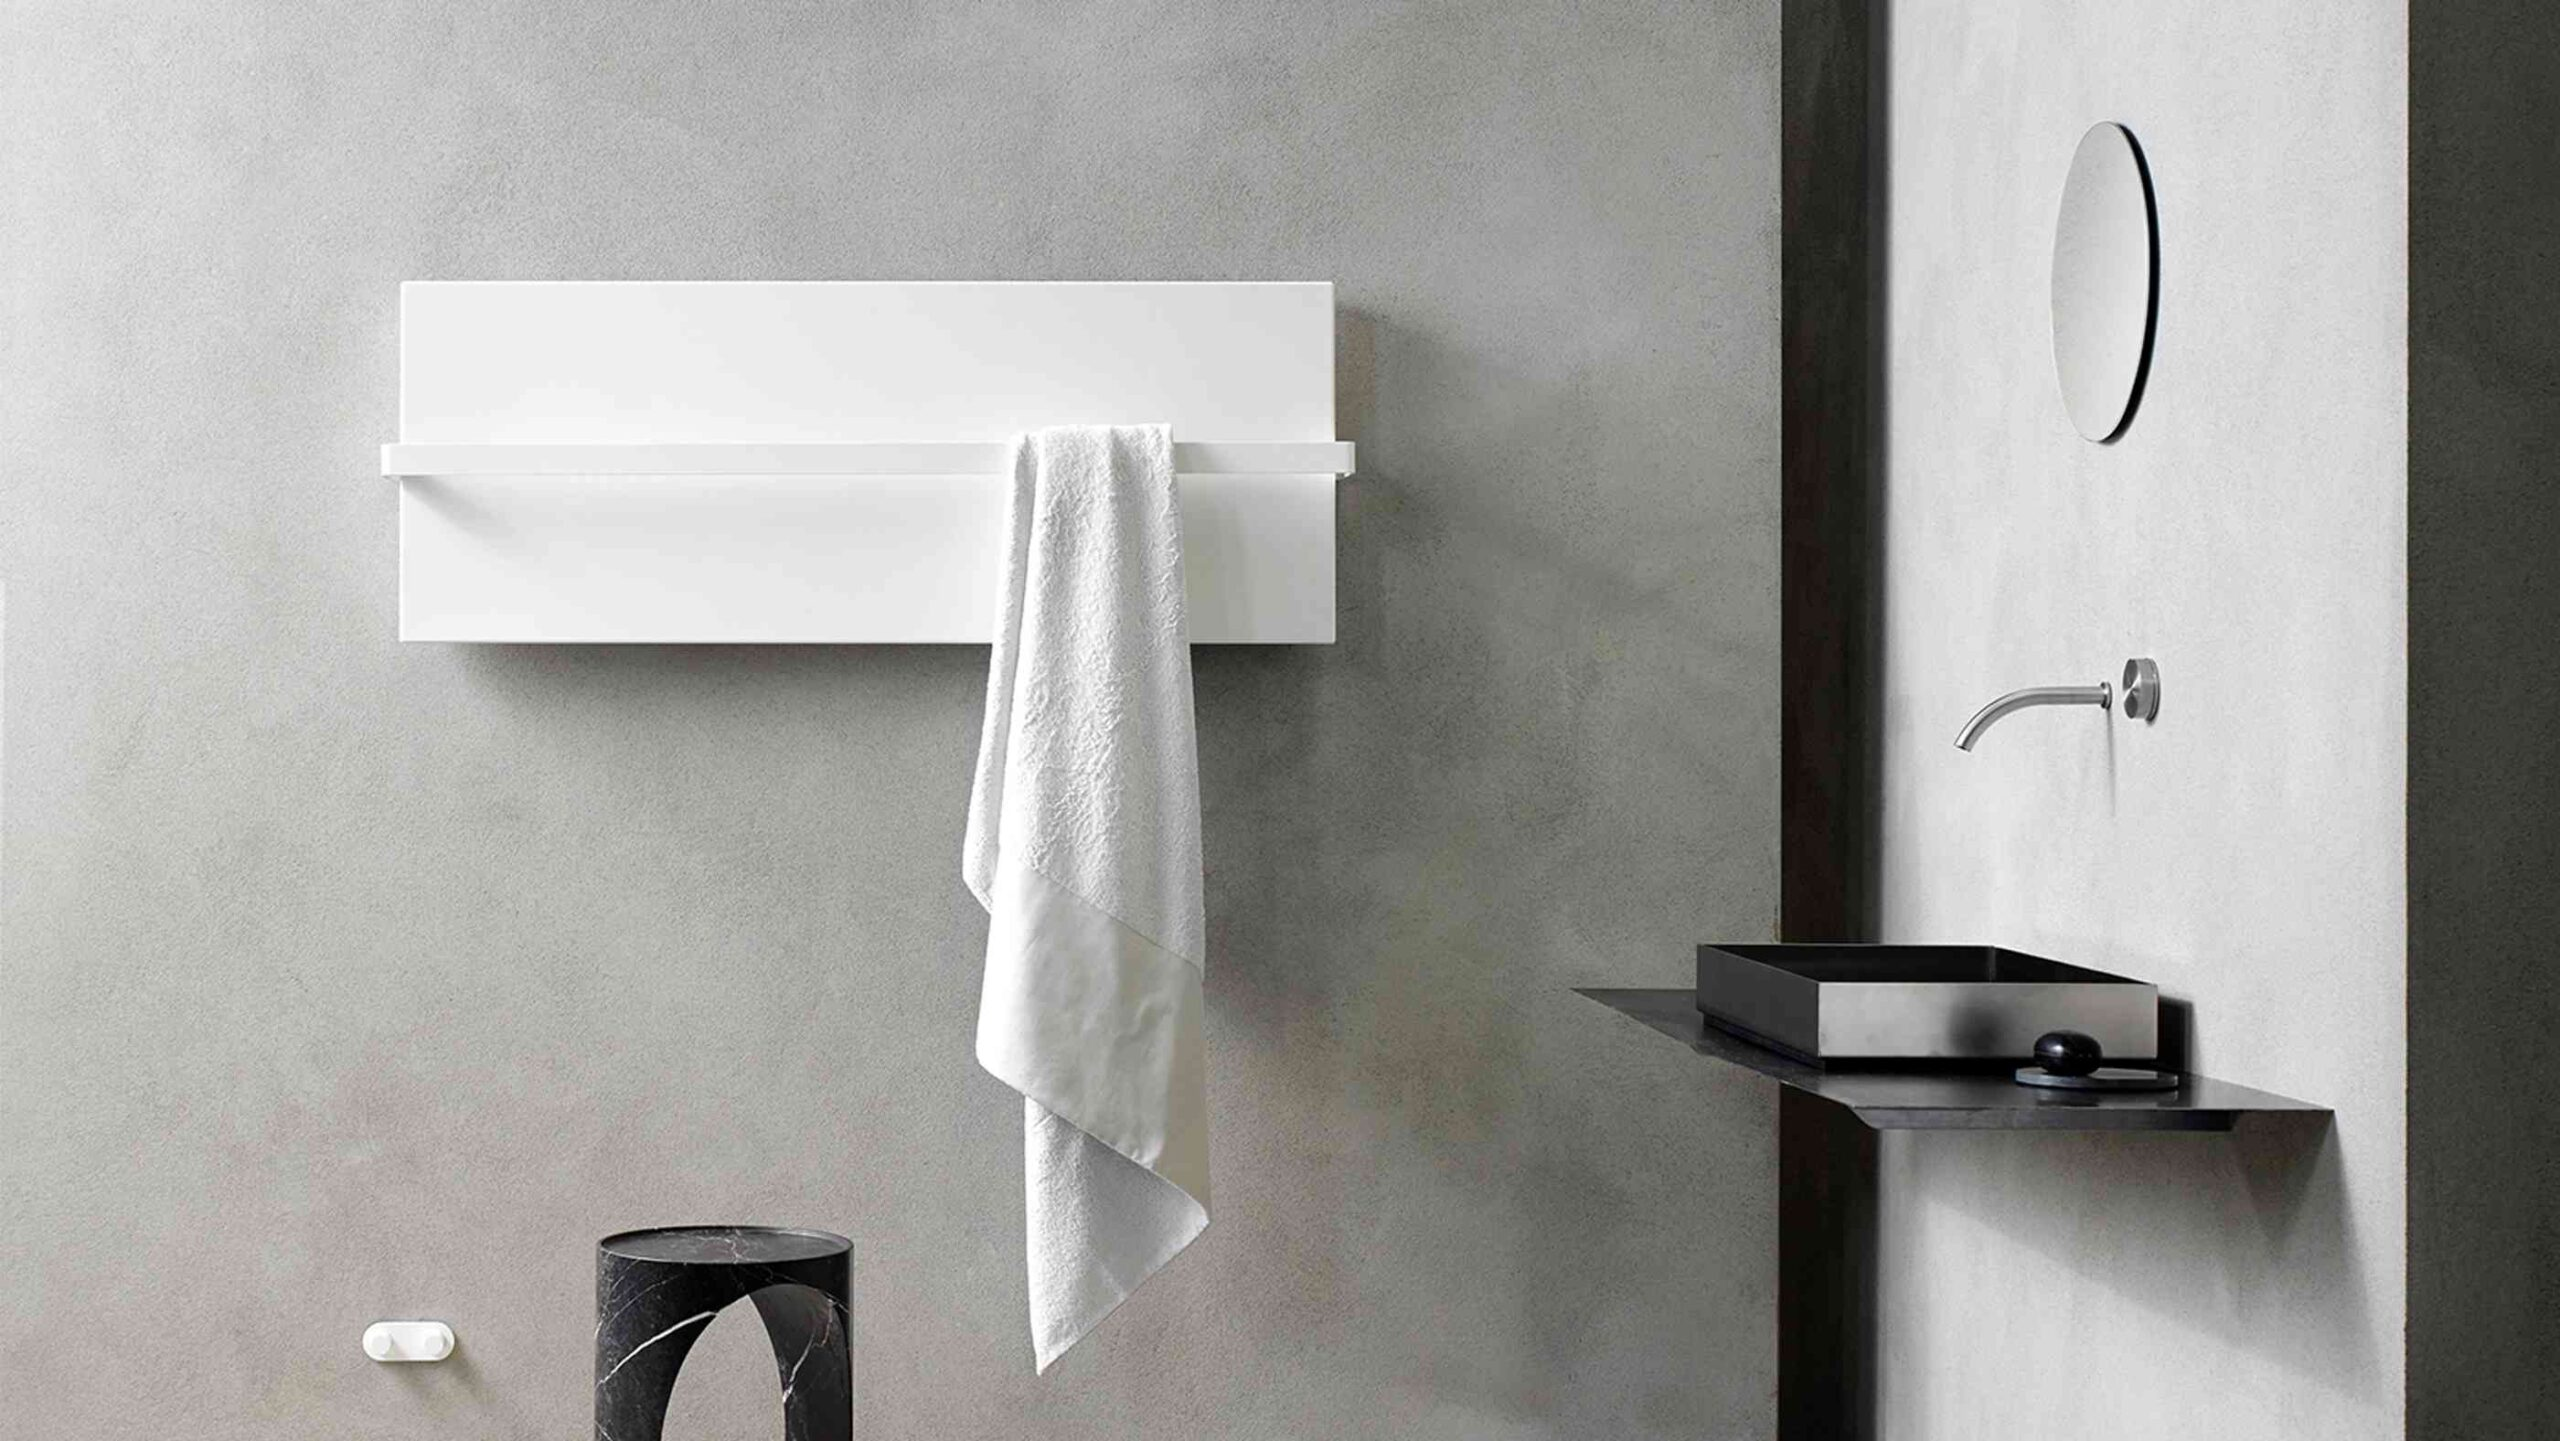 Full Size of Moderne Heizkrper Warm Bad Heizkörper Handtuchhalter Elektroheizkörper Wohnzimmer Küche Für Badezimmer Wohnzimmer Handtuchhalter Heizkörper